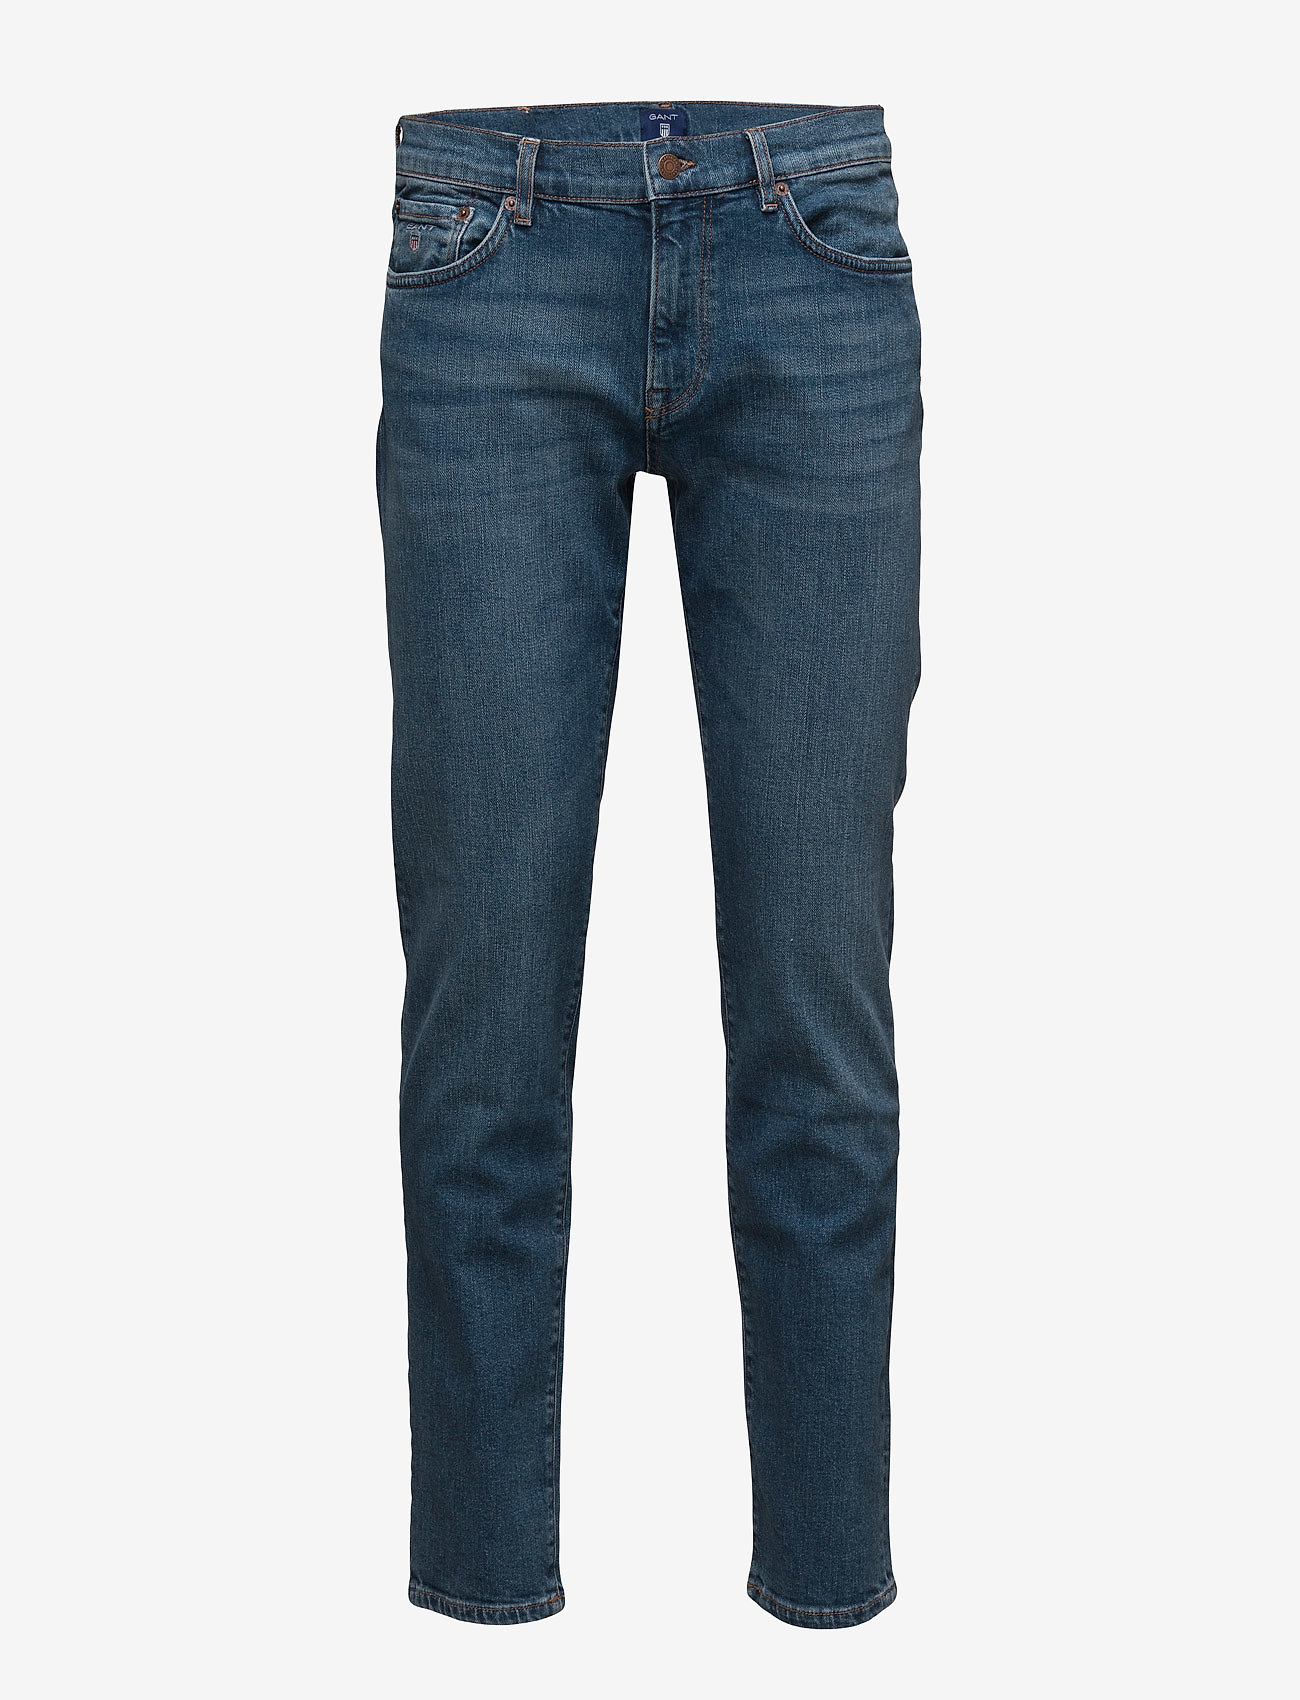 GANT - SLIM GANT JEANS - slim jeans - mid blue worn in - 0